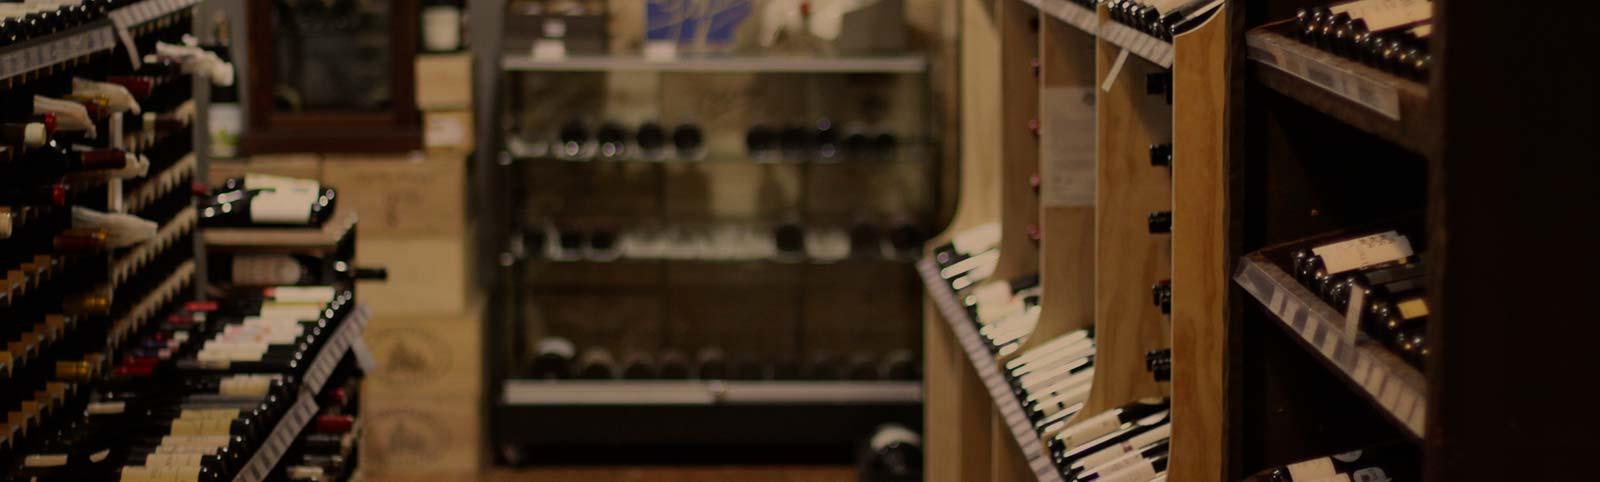 The Oak Barrel's Guide to Enjoying Older Wines